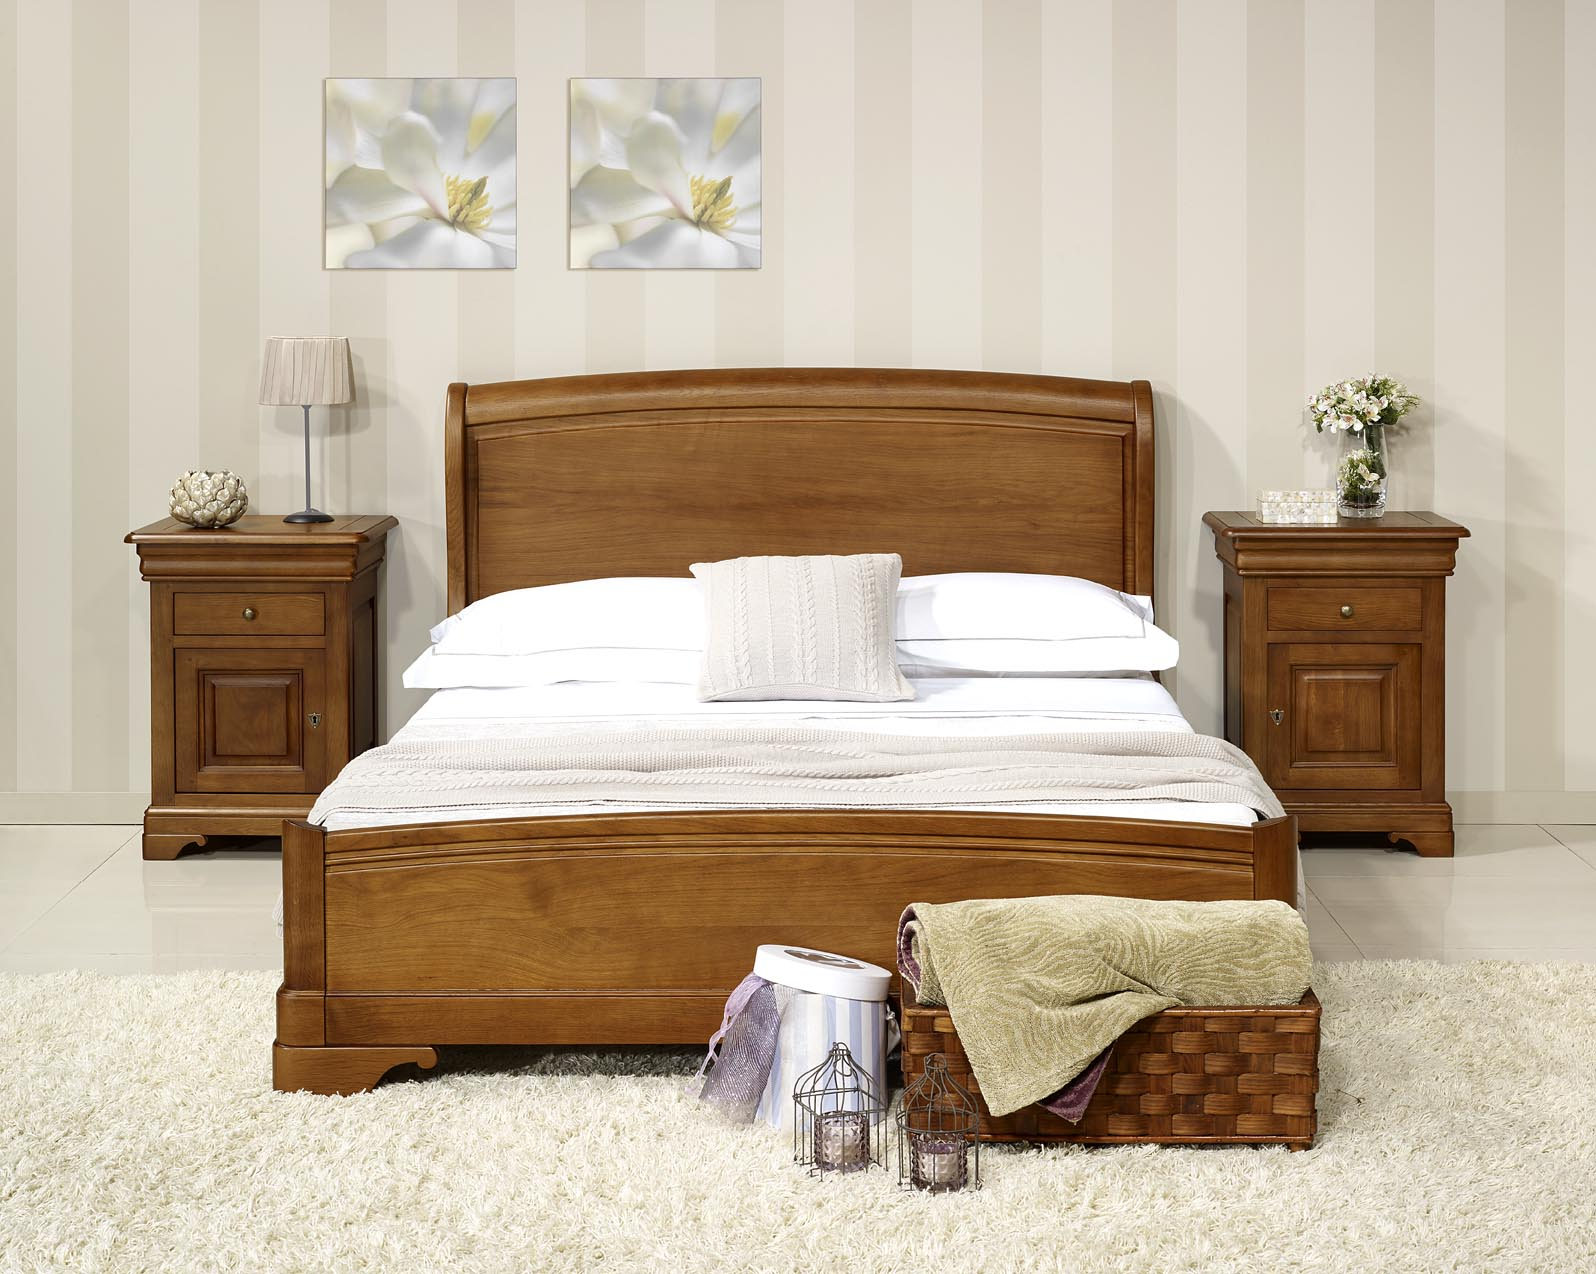 lit baptiste 140x190 en ch ne massif de style louis philippe finition ch ne moyen meuble en ch ne. Black Bedroom Furniture Sets. Home Design Ideas